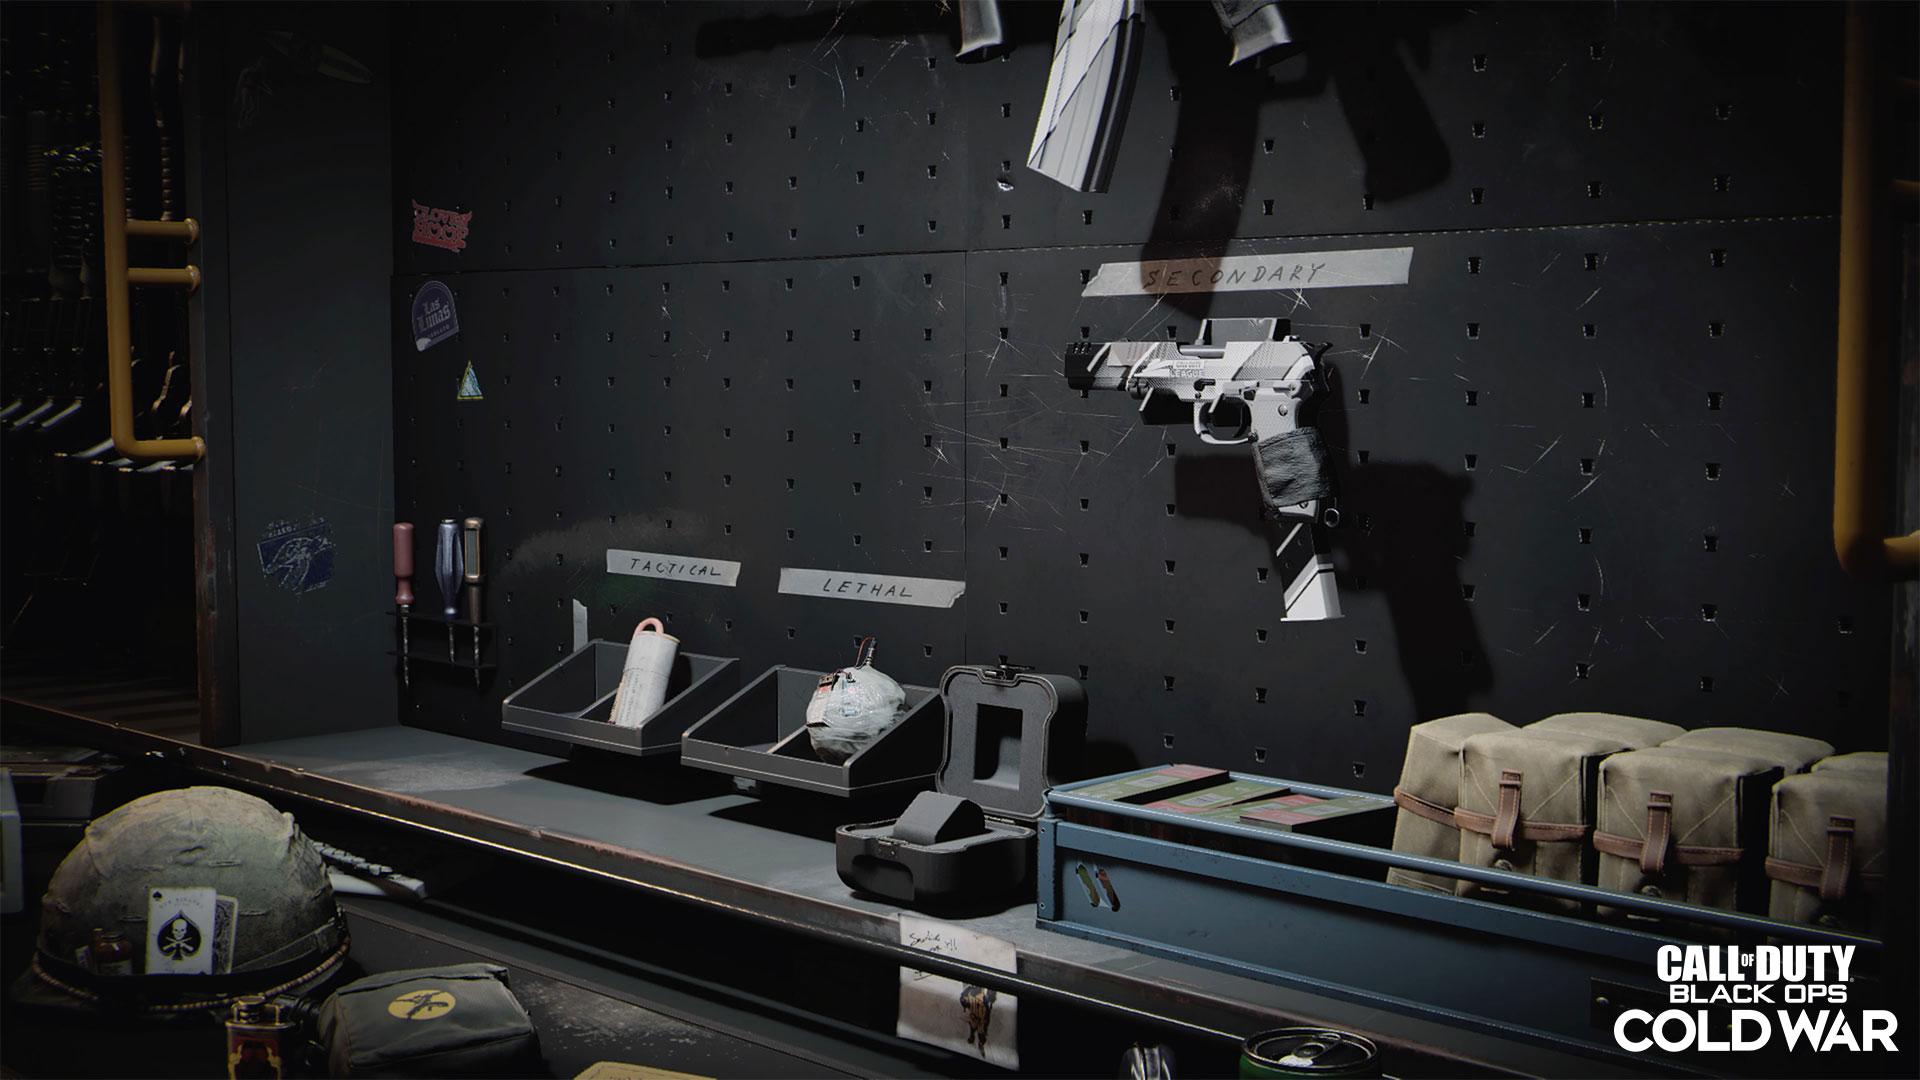 Pro issue pistol